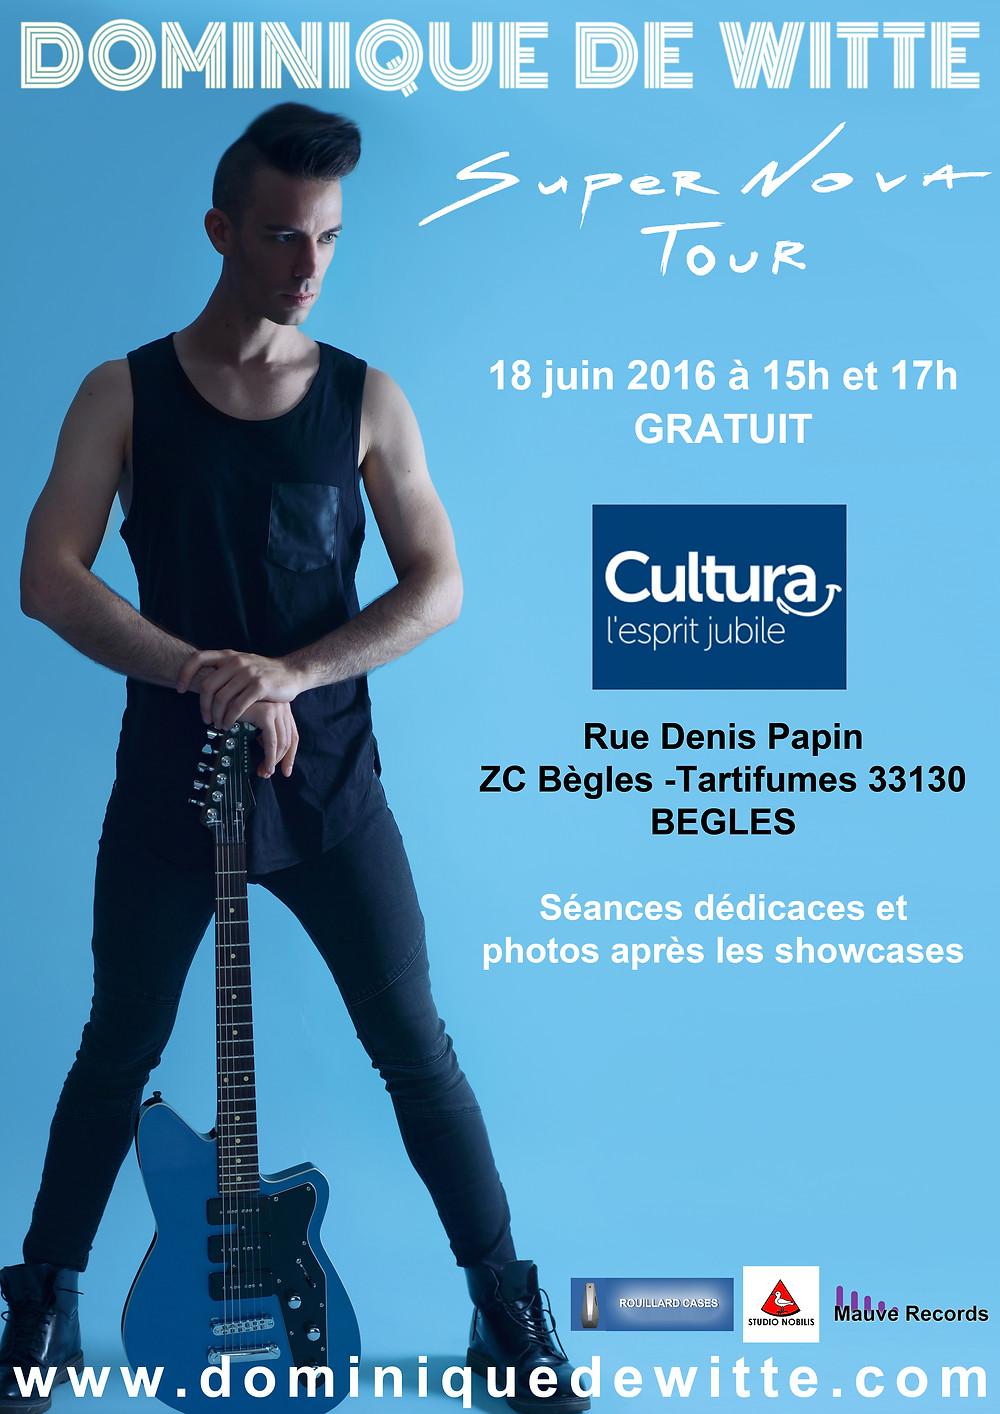 Dominique de Witte - SUPERNOVA TOUR - CULTURA à BEGLES 18 juin 2016